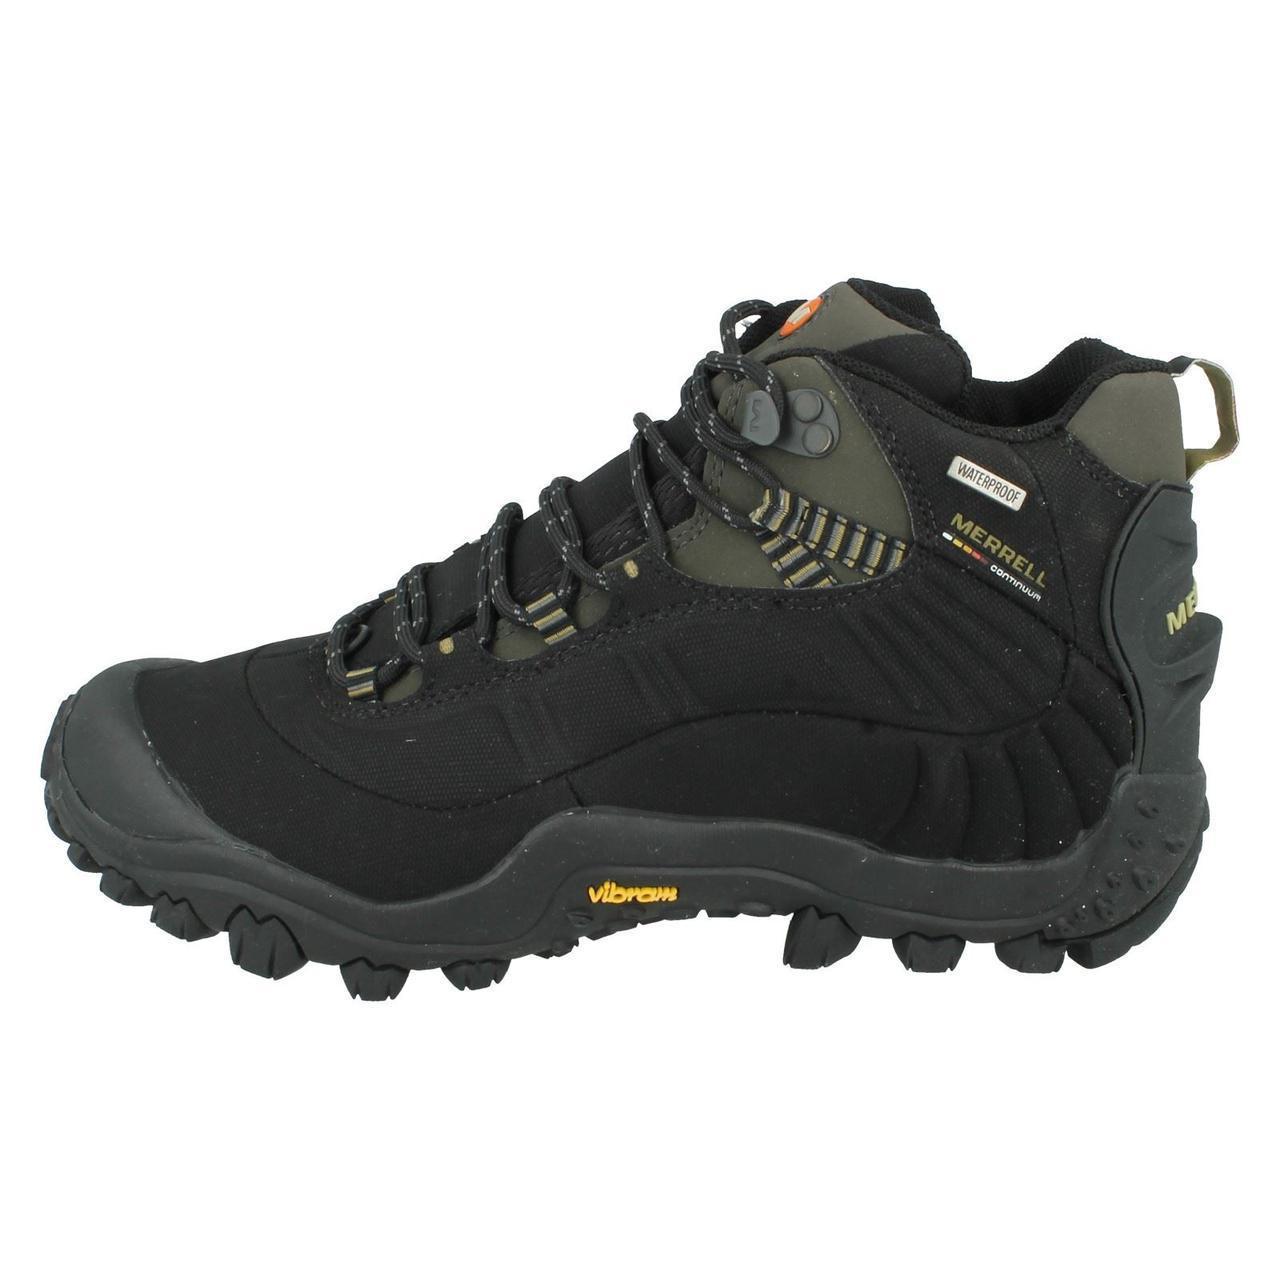 d50d7b05 Мужские зимние ботинки Merrell Chameleon Thermo 6 WTPF: продажа ...